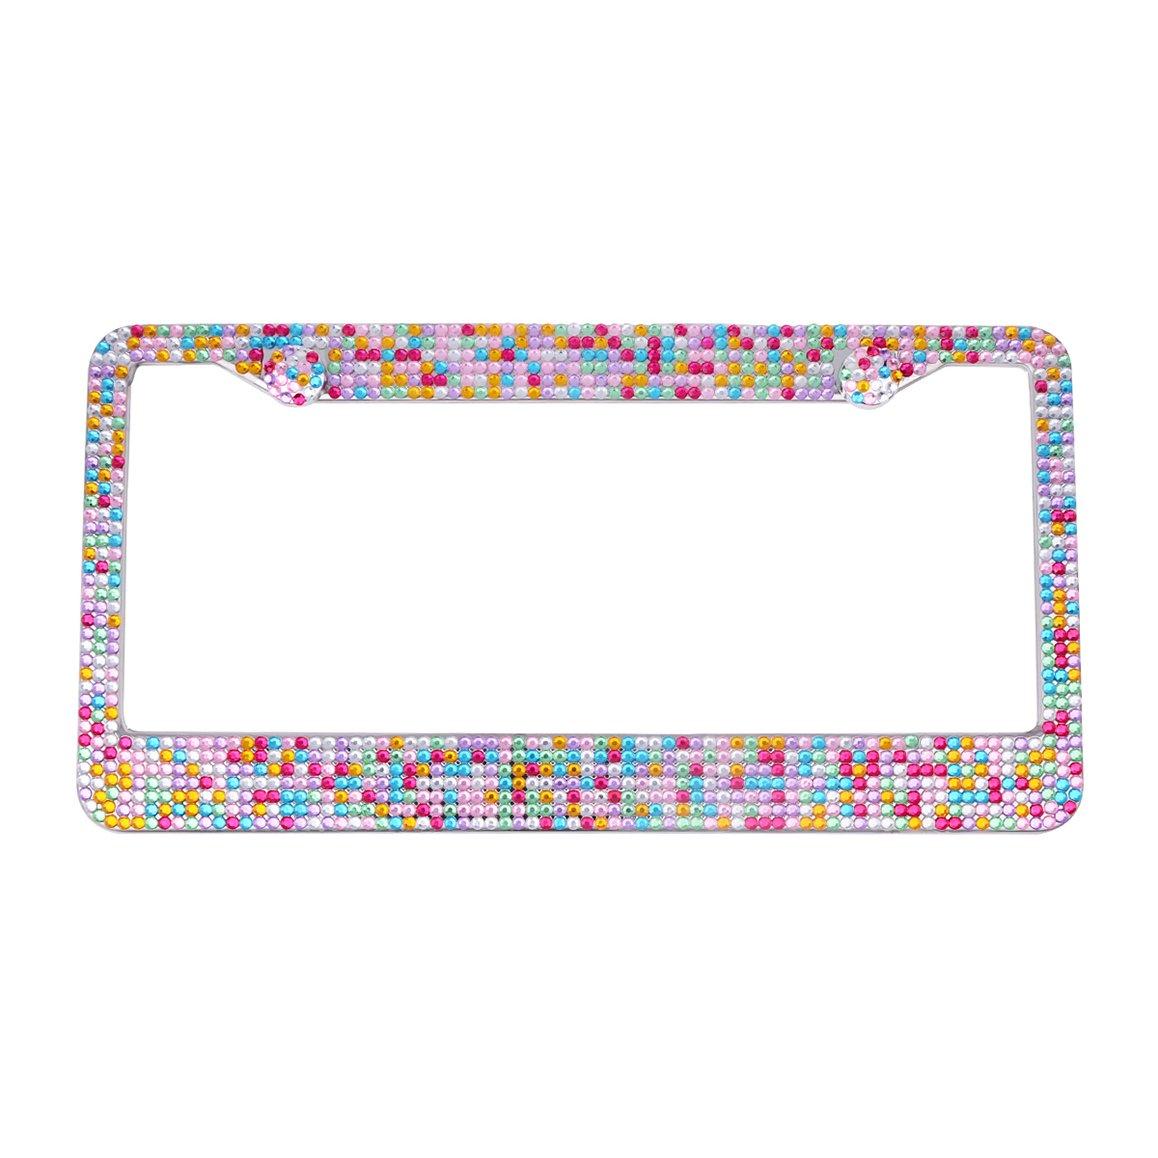 Cheap Sparkle License Plate Frames, find Sparkle License Plate ...